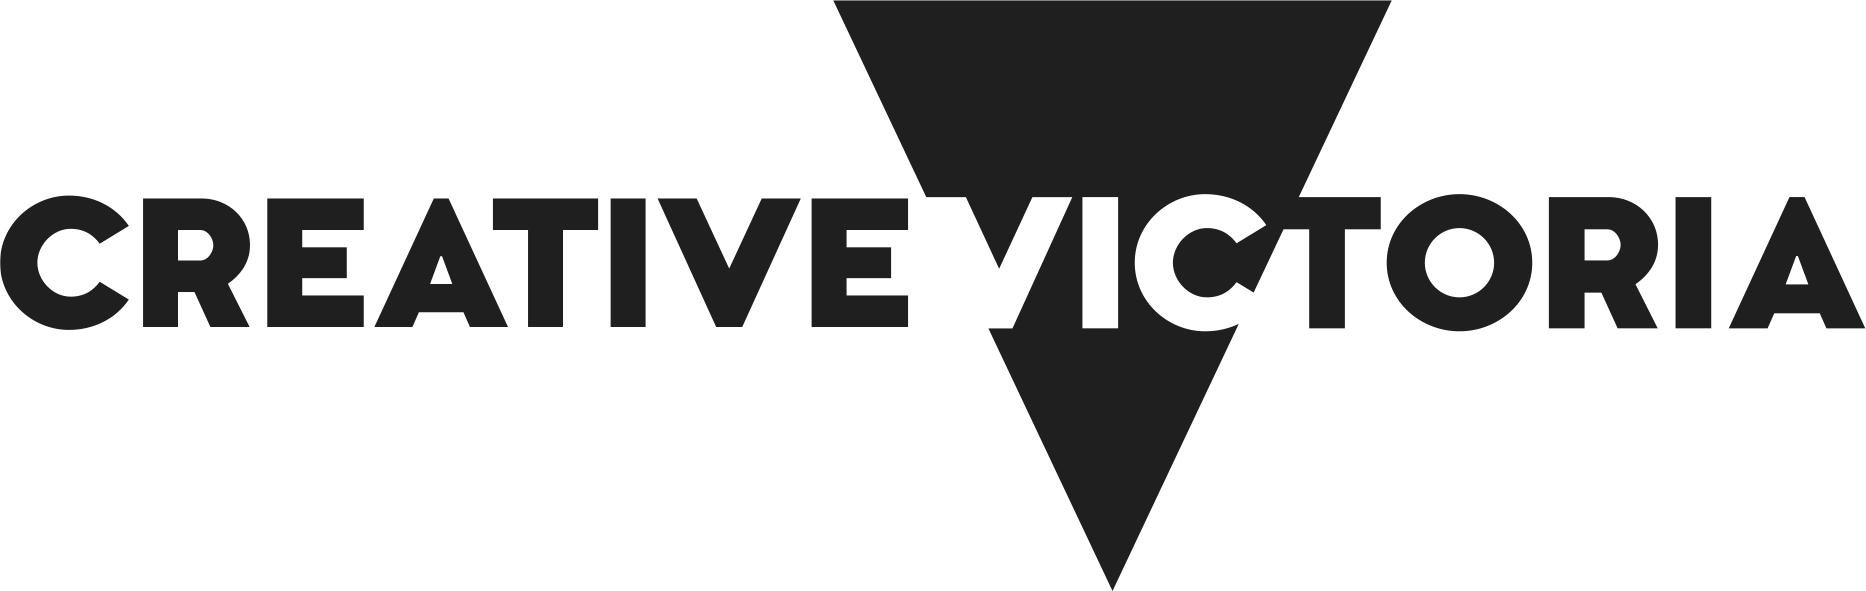 CreativeVictoriaLogo300.png